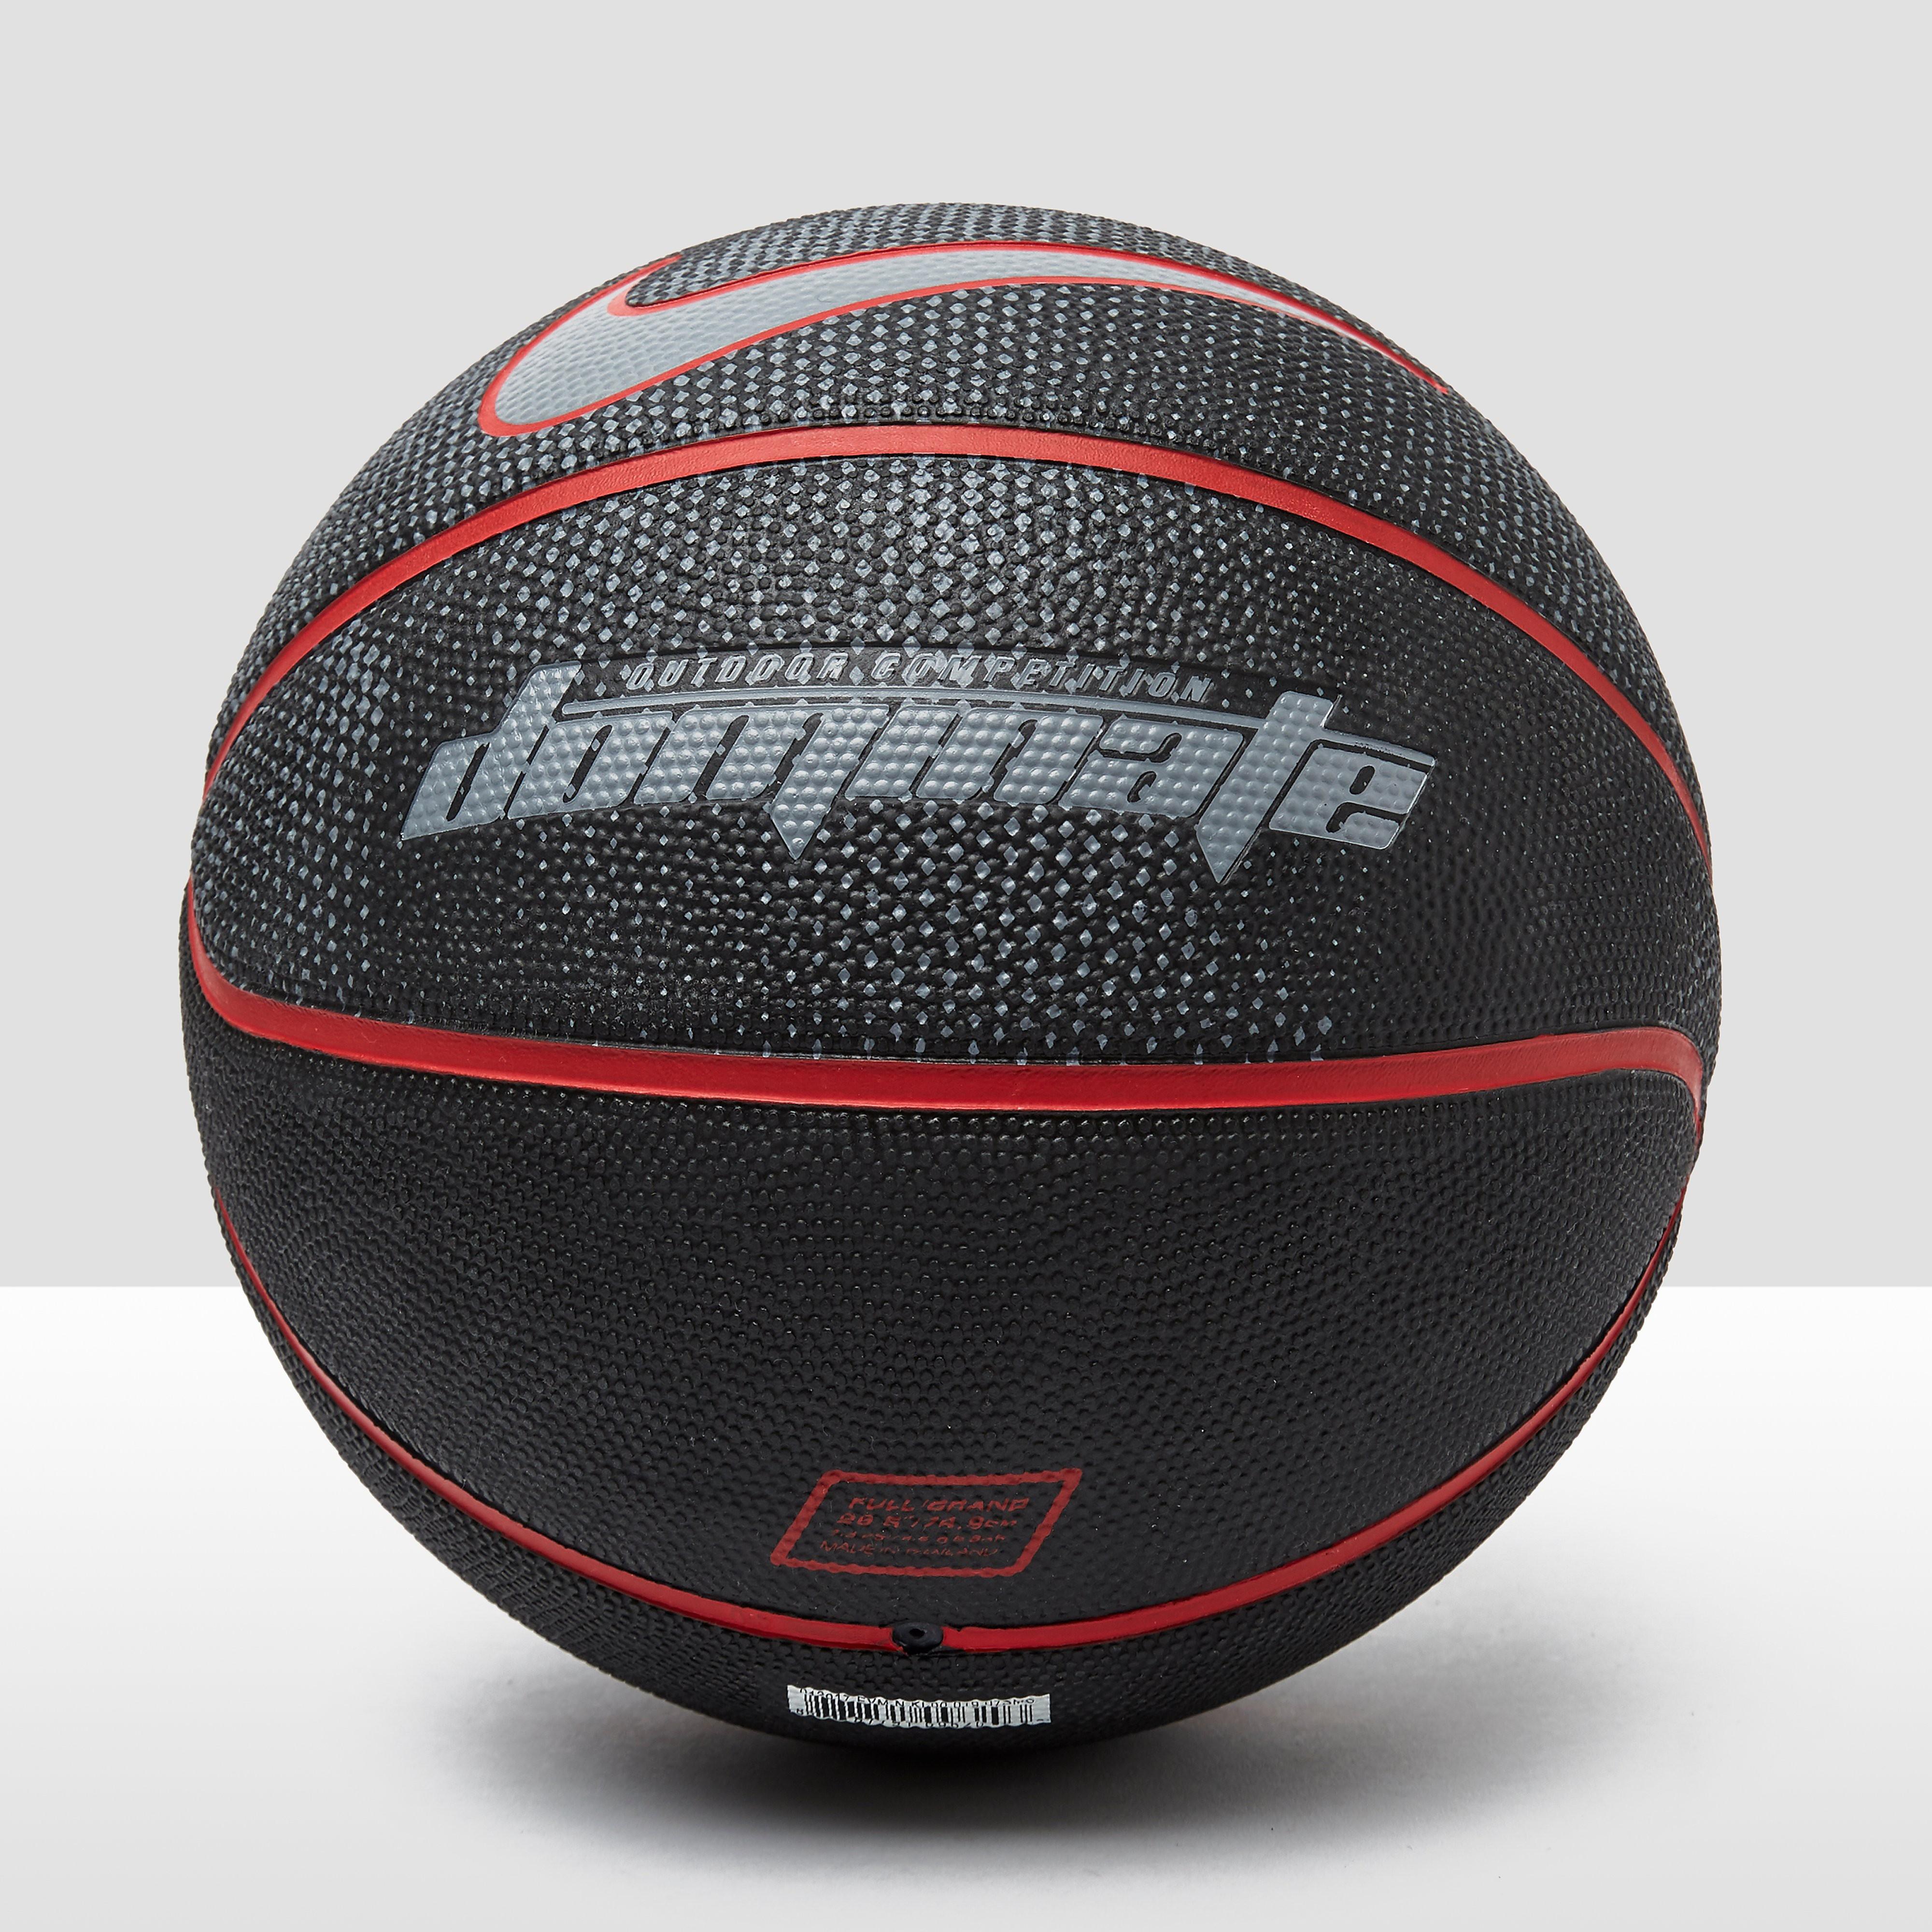 Dominate Basketbal Zwart/Rood